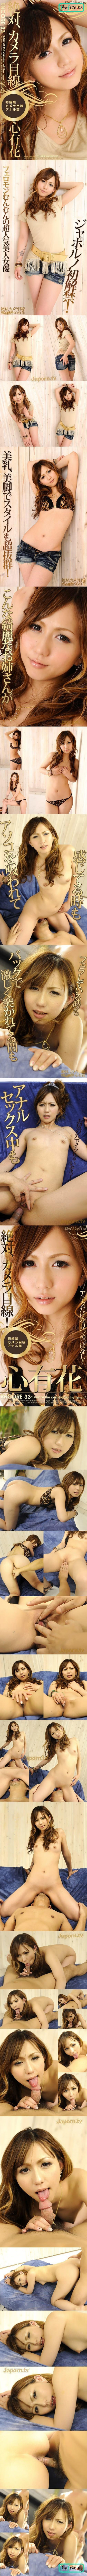 [S2M 033] Encore Vol.33 : Kokoro Yuka 心有花 S2M Kokoro Yuka